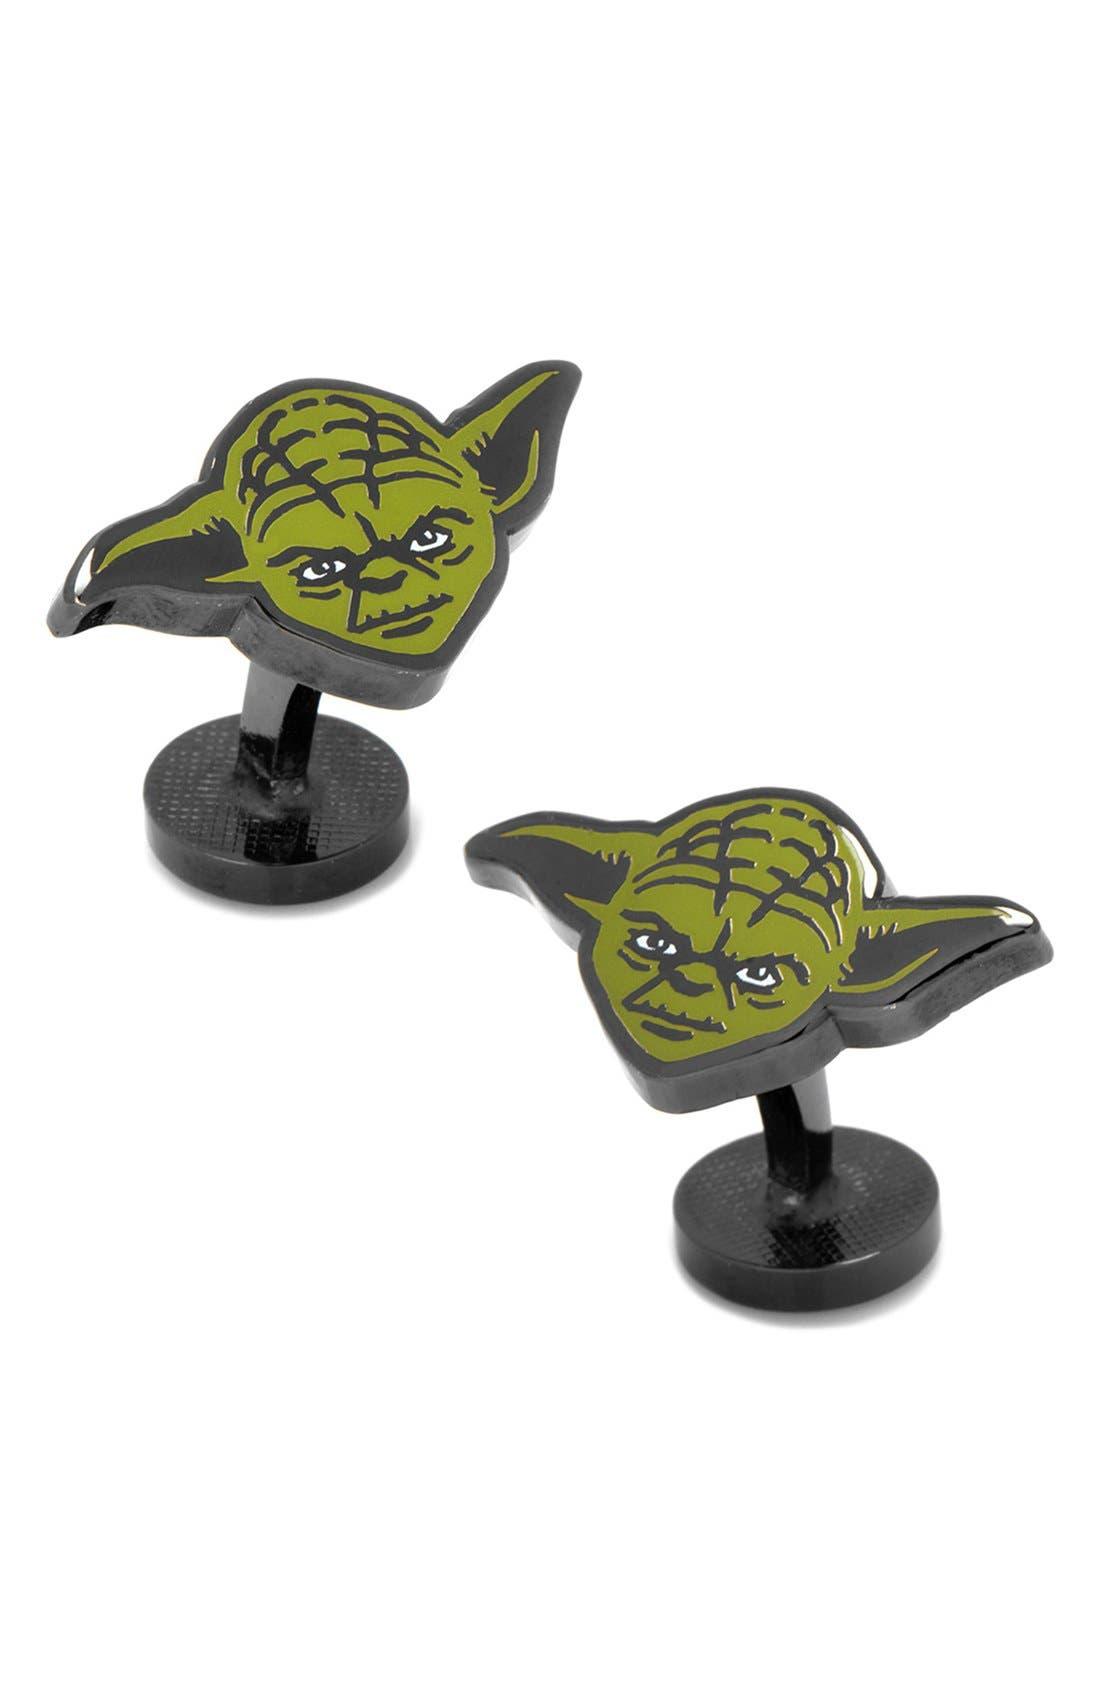 'Star Wars - Yoda' Cuff Links,                             Main thumbnail 1, color,                             Green/ Black